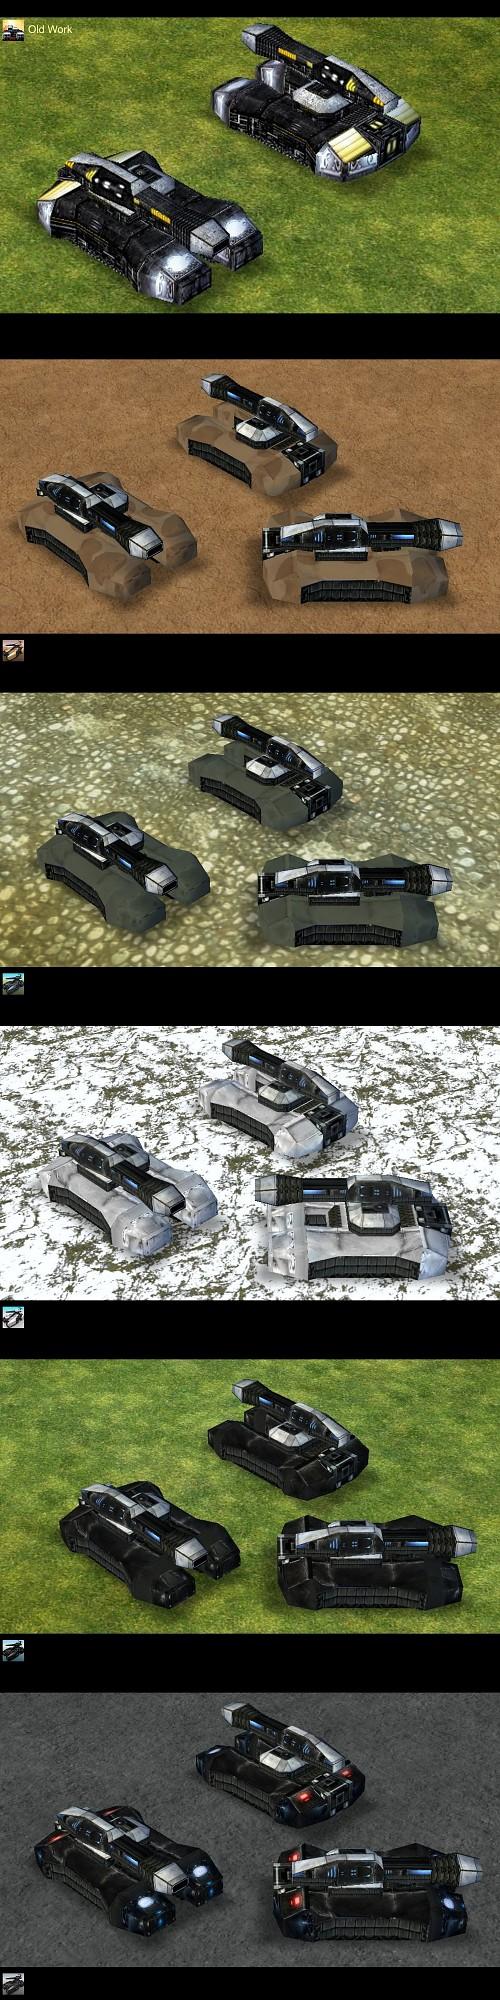 Empire Earth: Gladiator Tank Multiple Skins